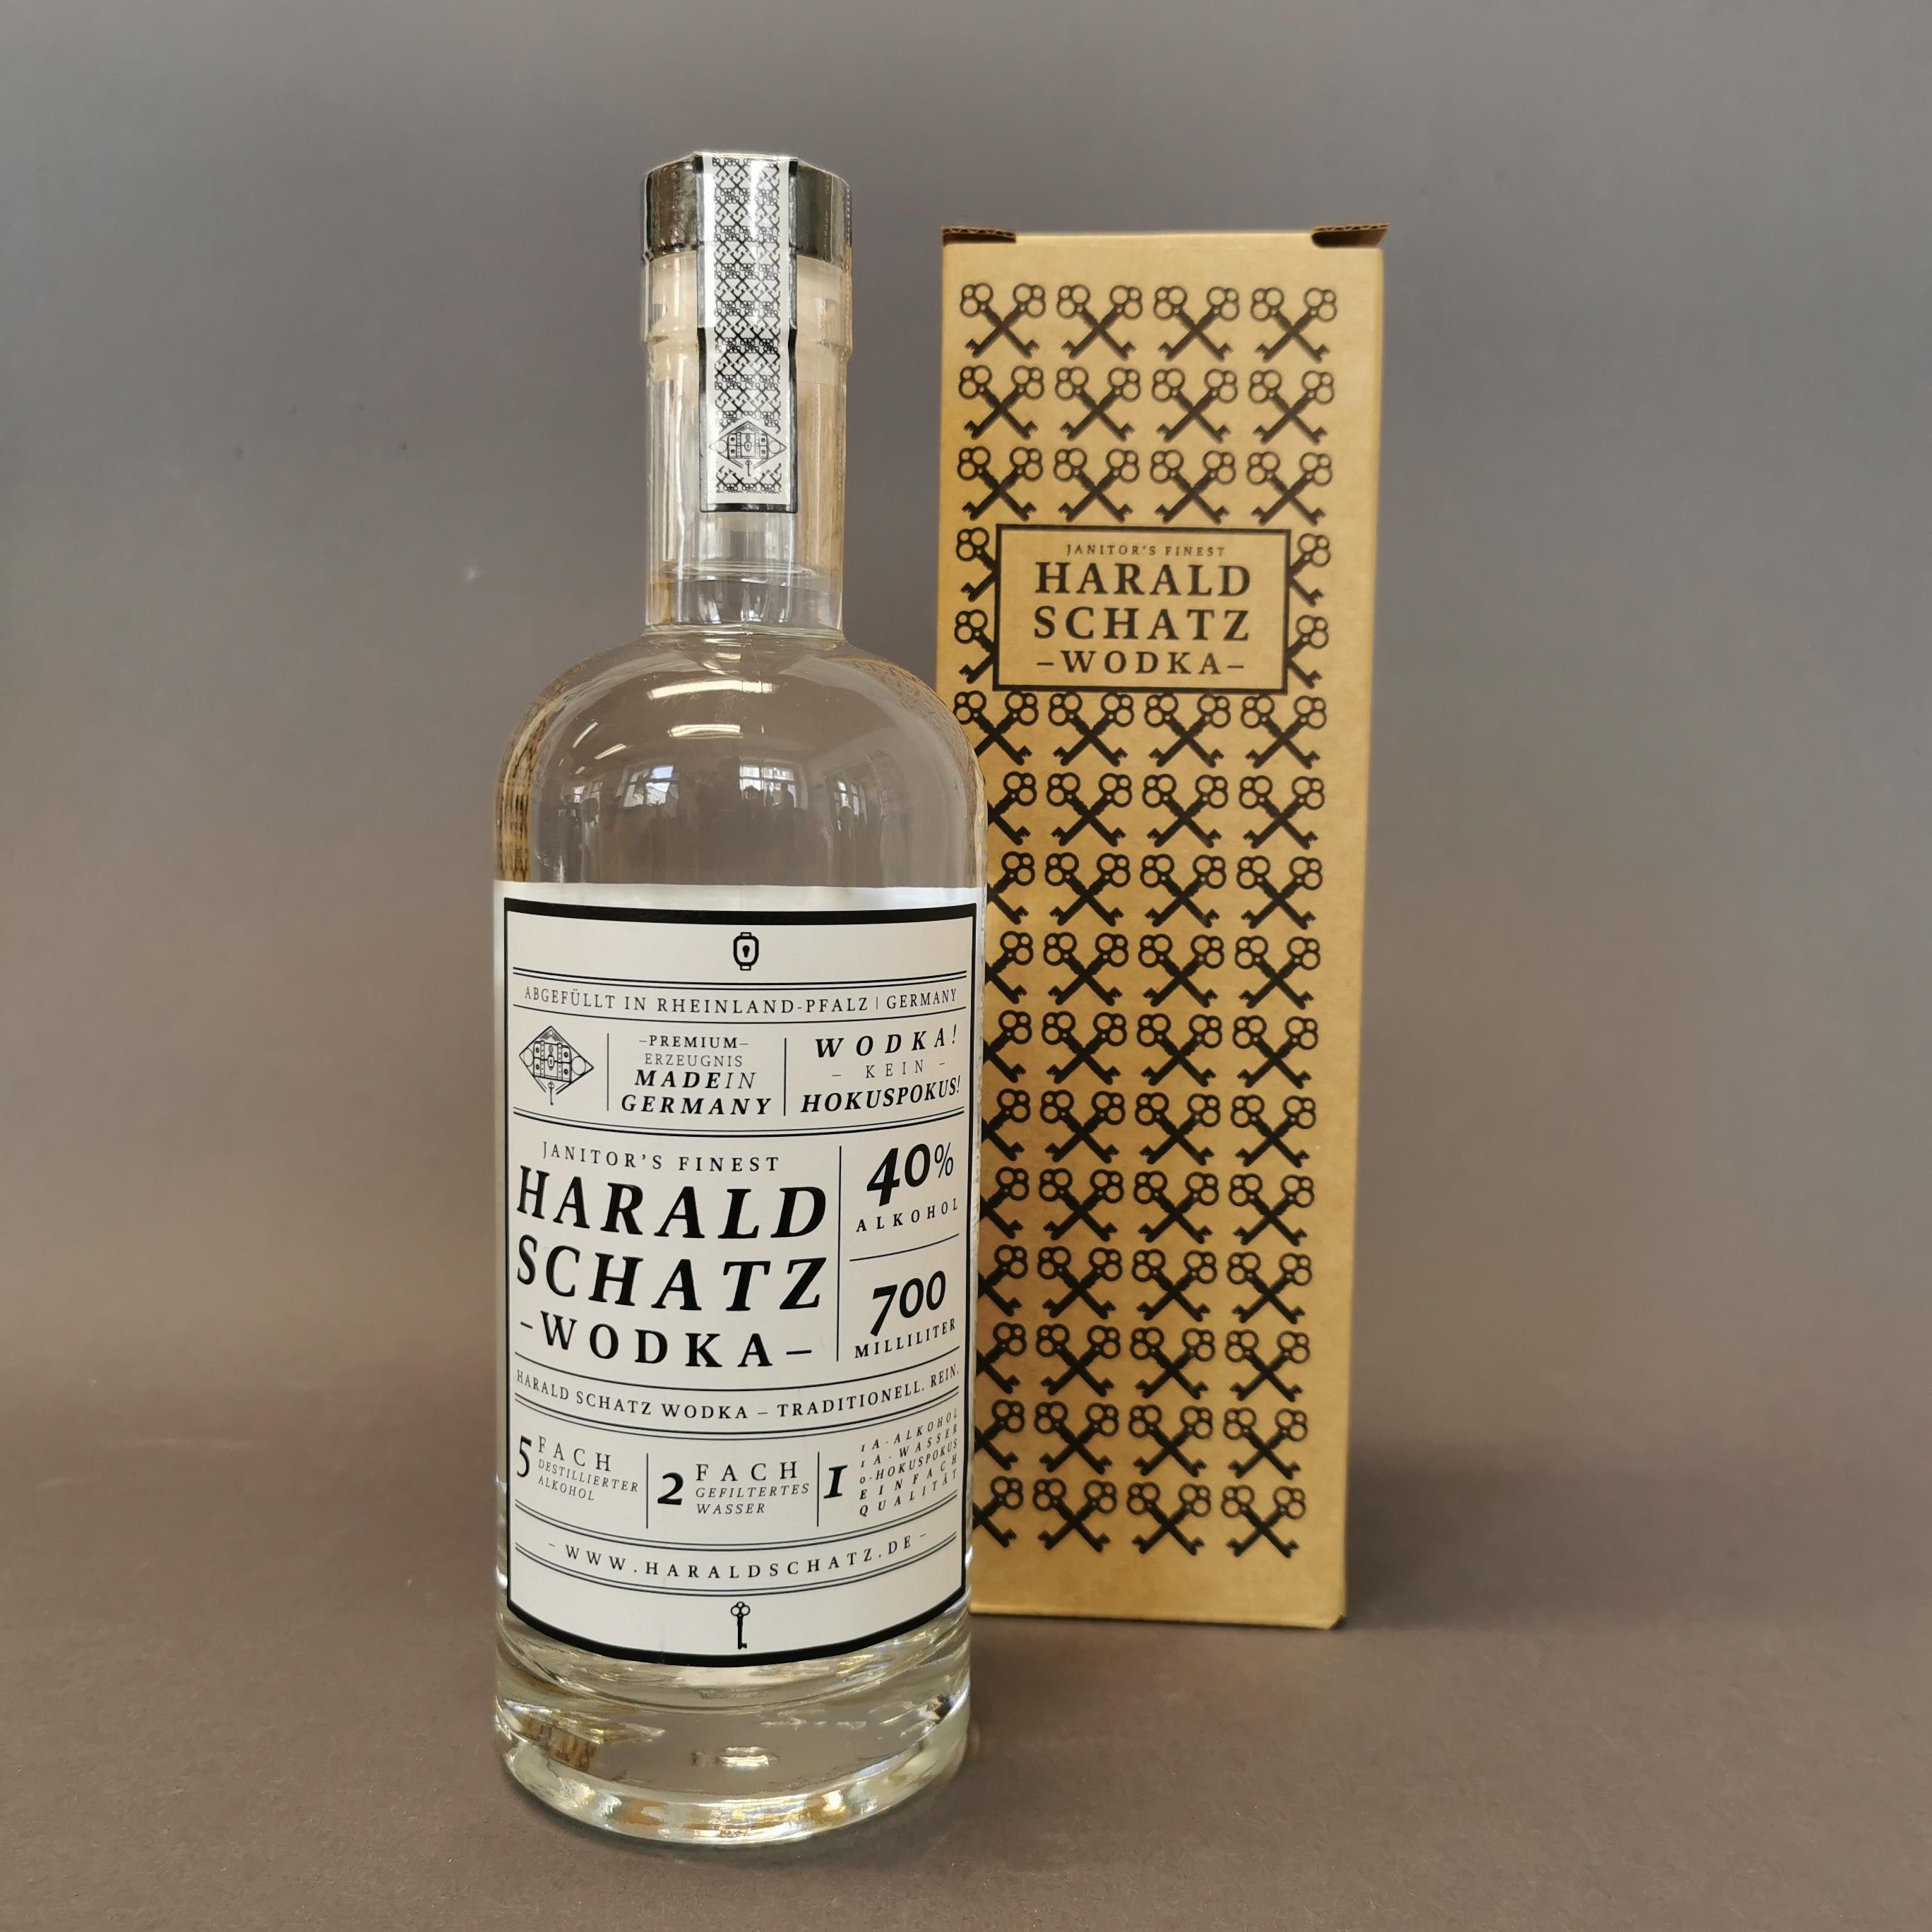 Harald Schatz Wodka